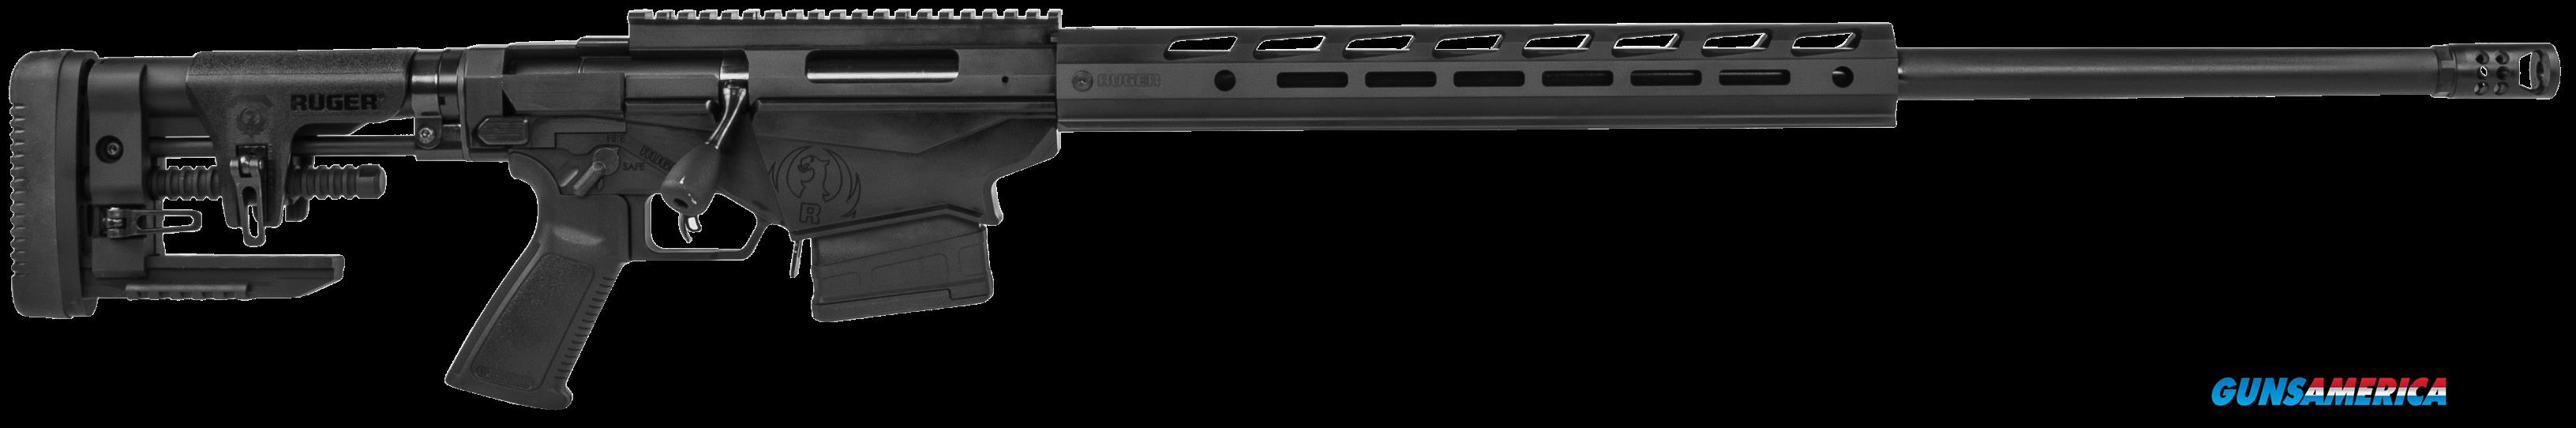 Ruger Precision, Rug 18057 Precision 6mmcr 15in Mp Mlok Fold 26 10r  Guns > Pistols > 1911 Pistol Copies (non-Colt)